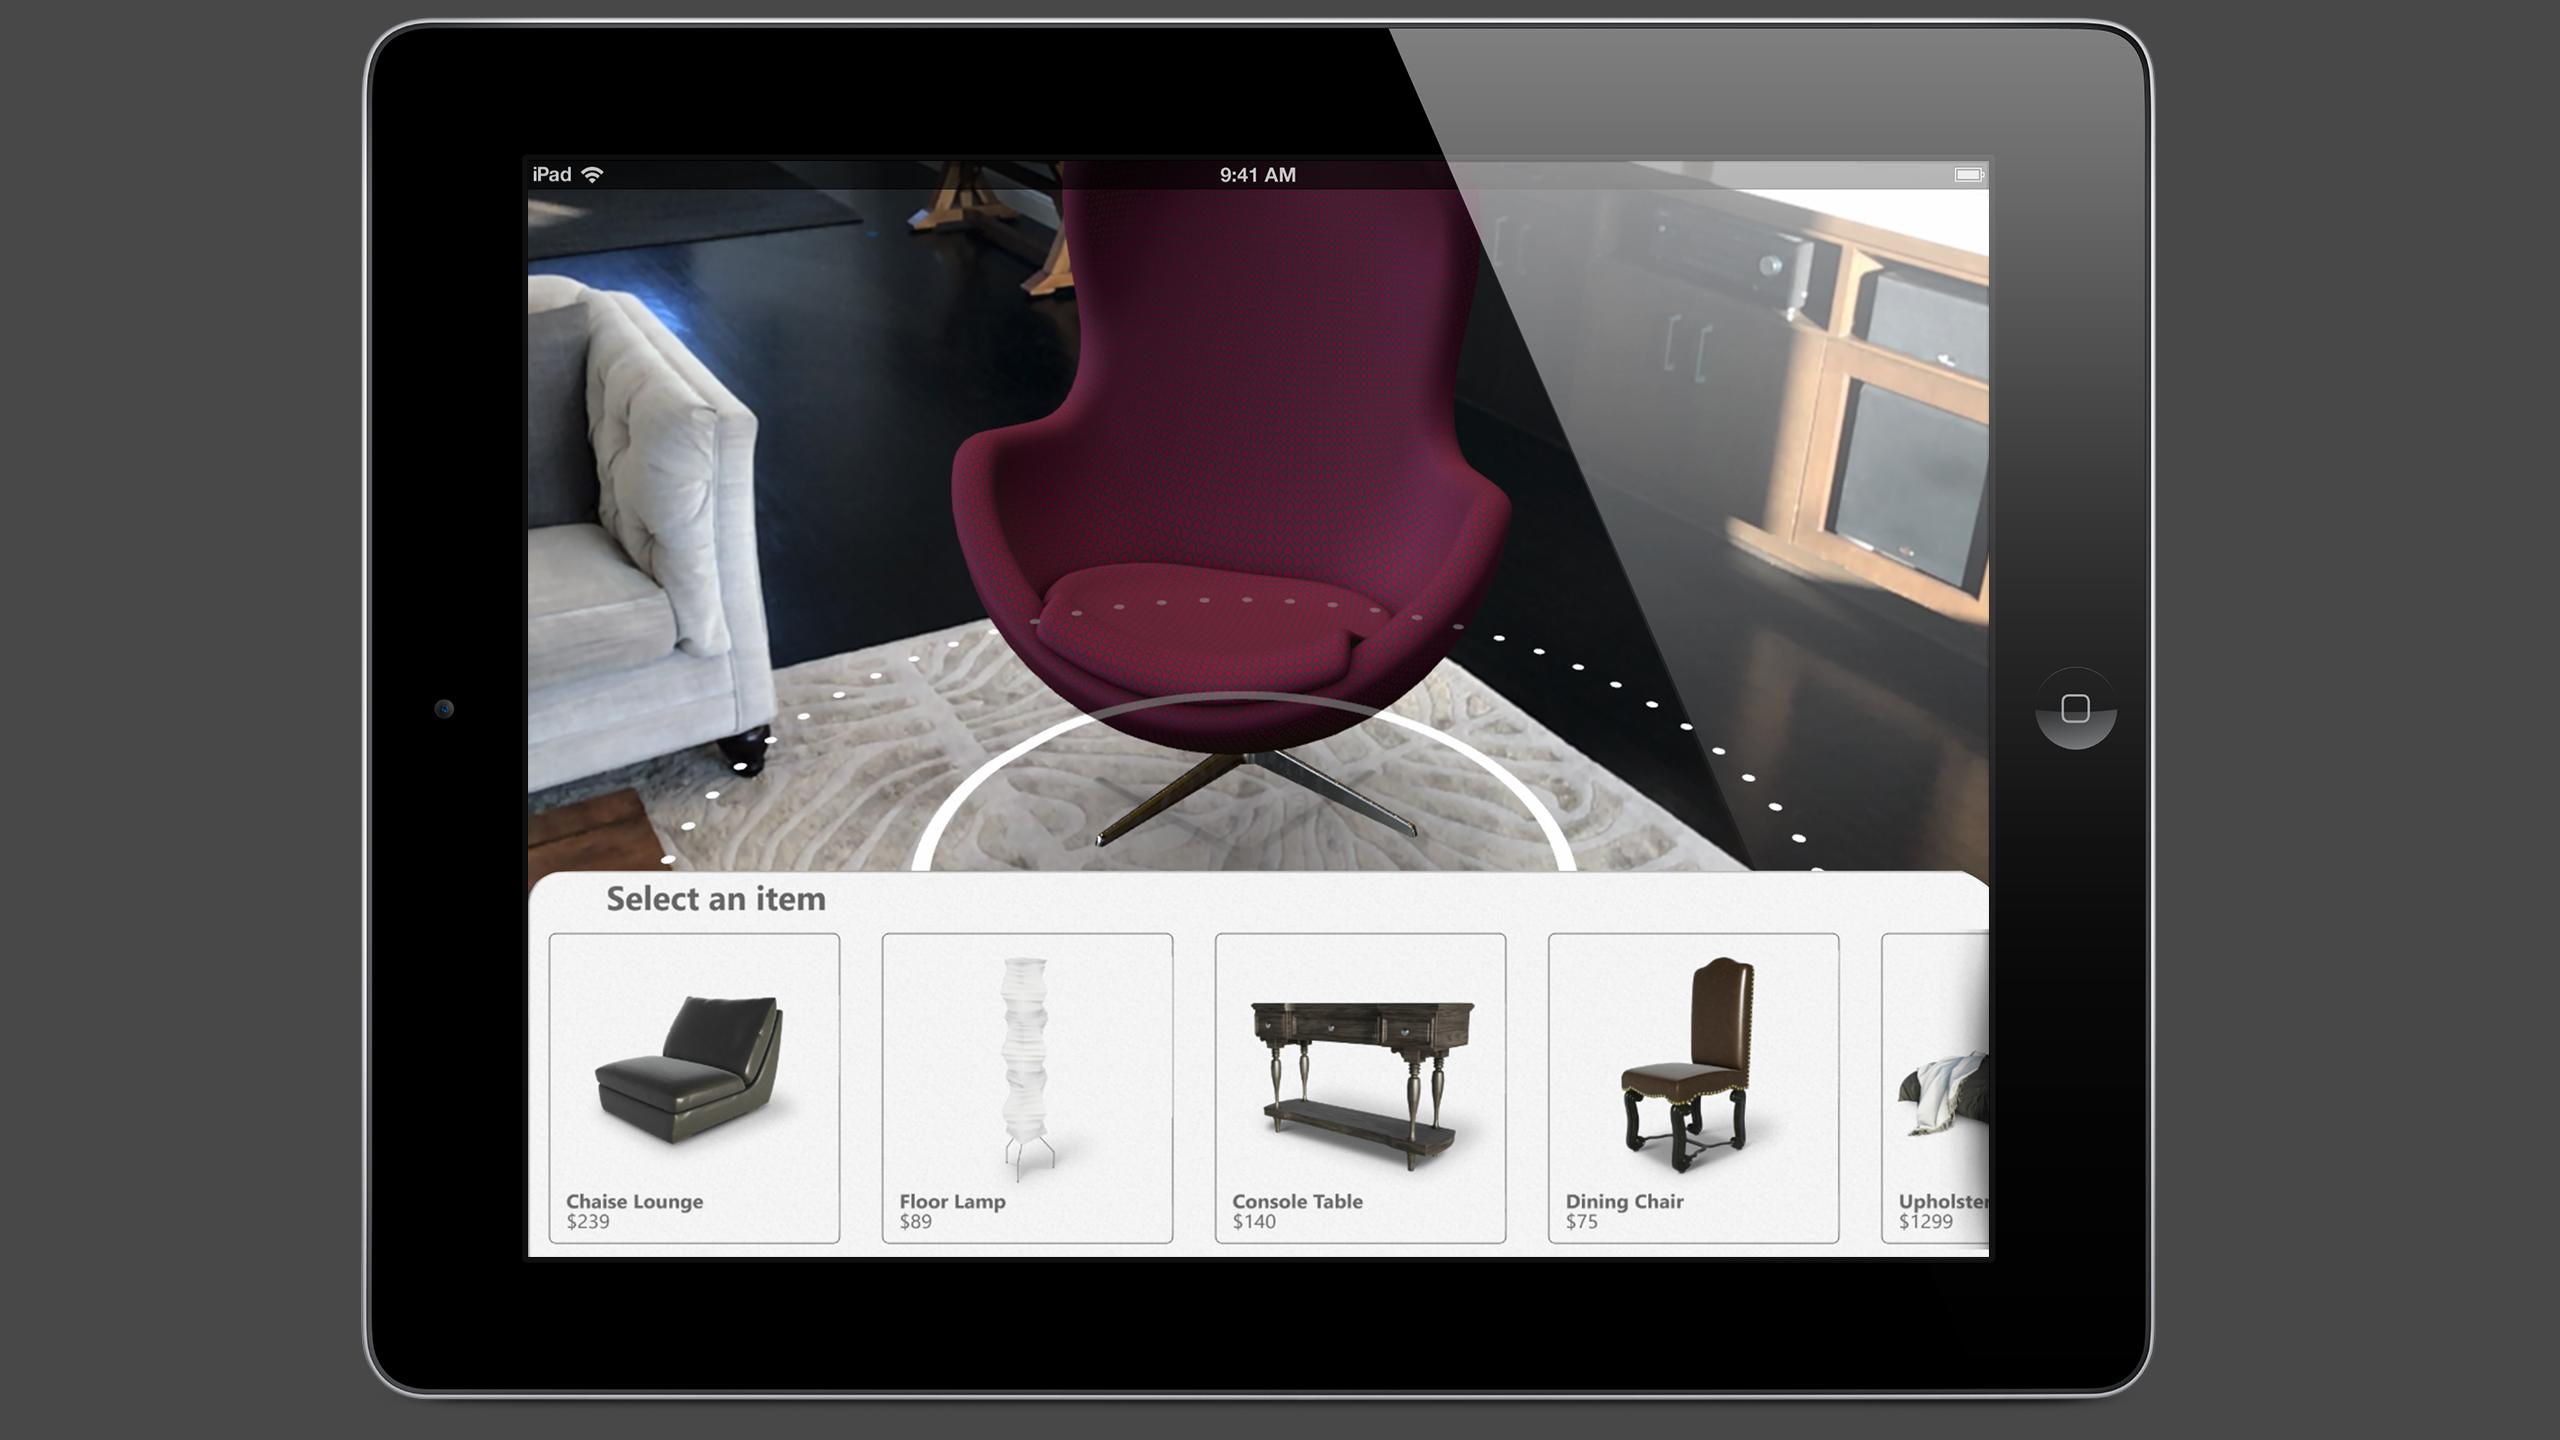 Augmented Reality AR Kit